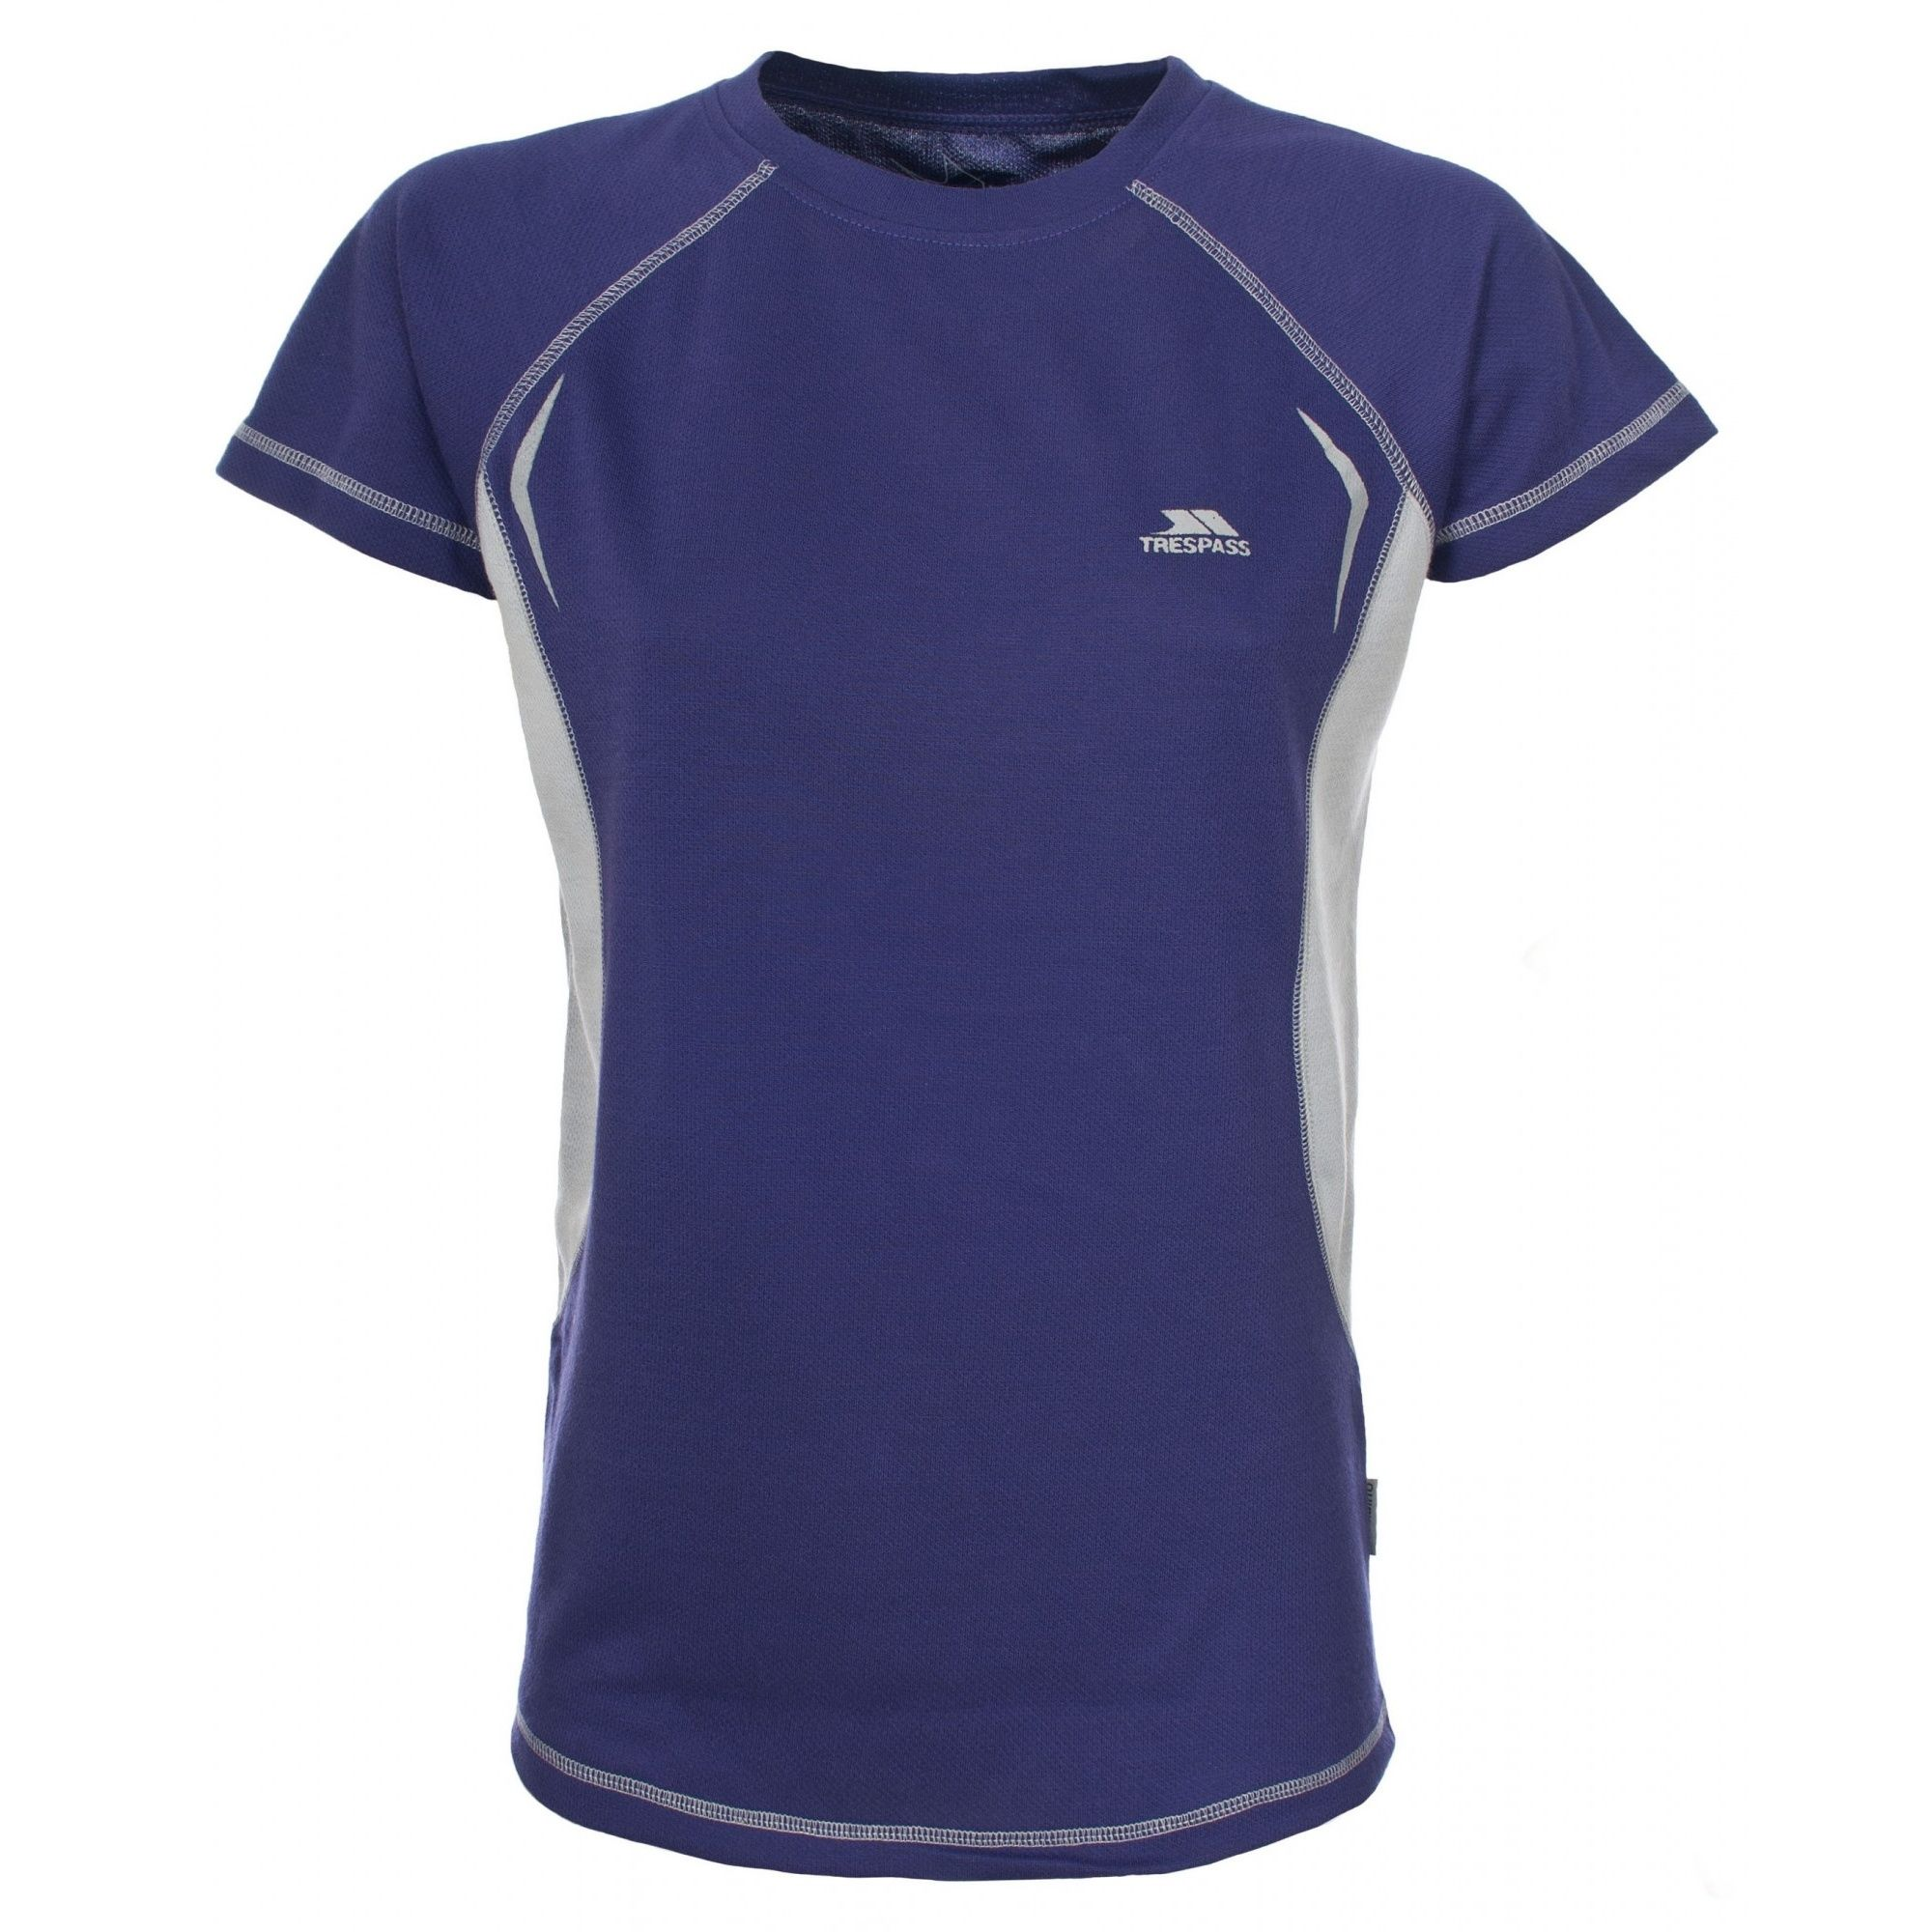 Trespass Womens/Ladies Emmie Active Short Sleeve Baselayer Top